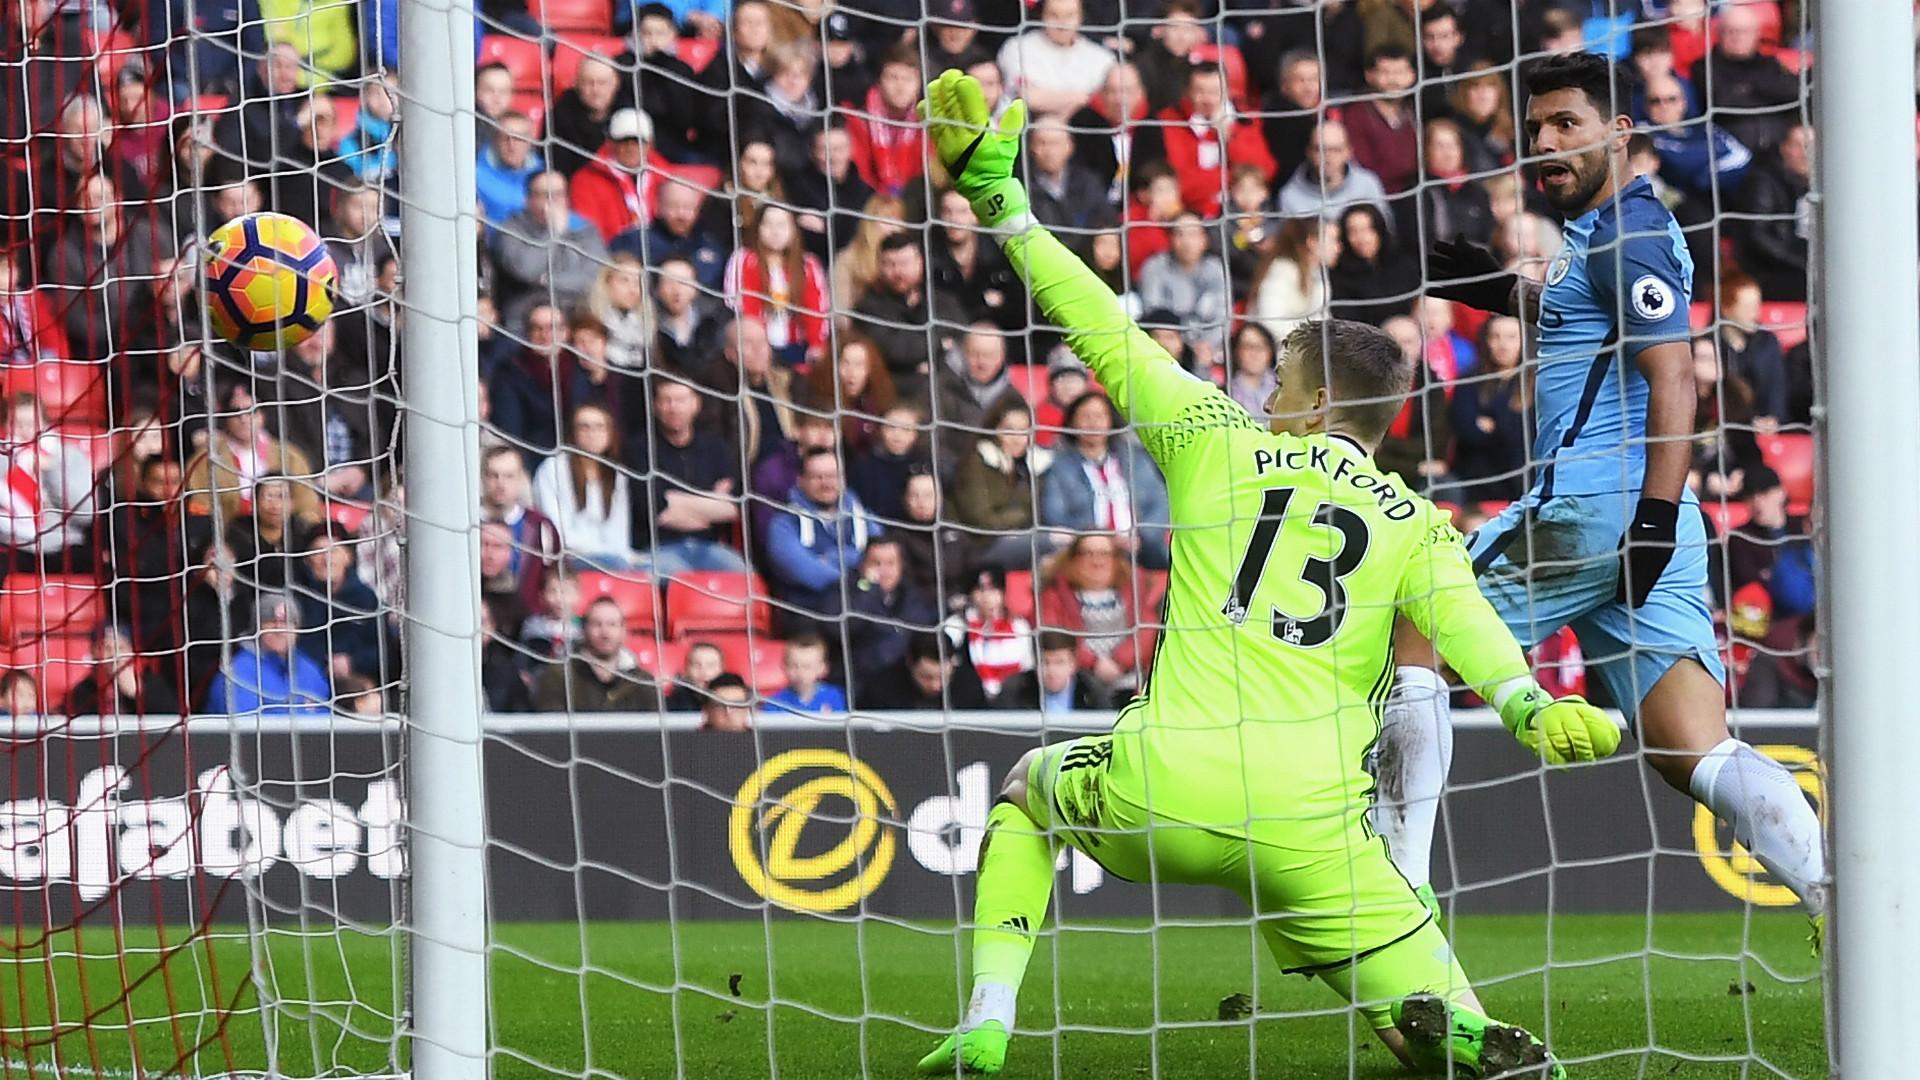 Sergio Aguero Jordan Pickford Sunderland Manchester City Premier League 05032017